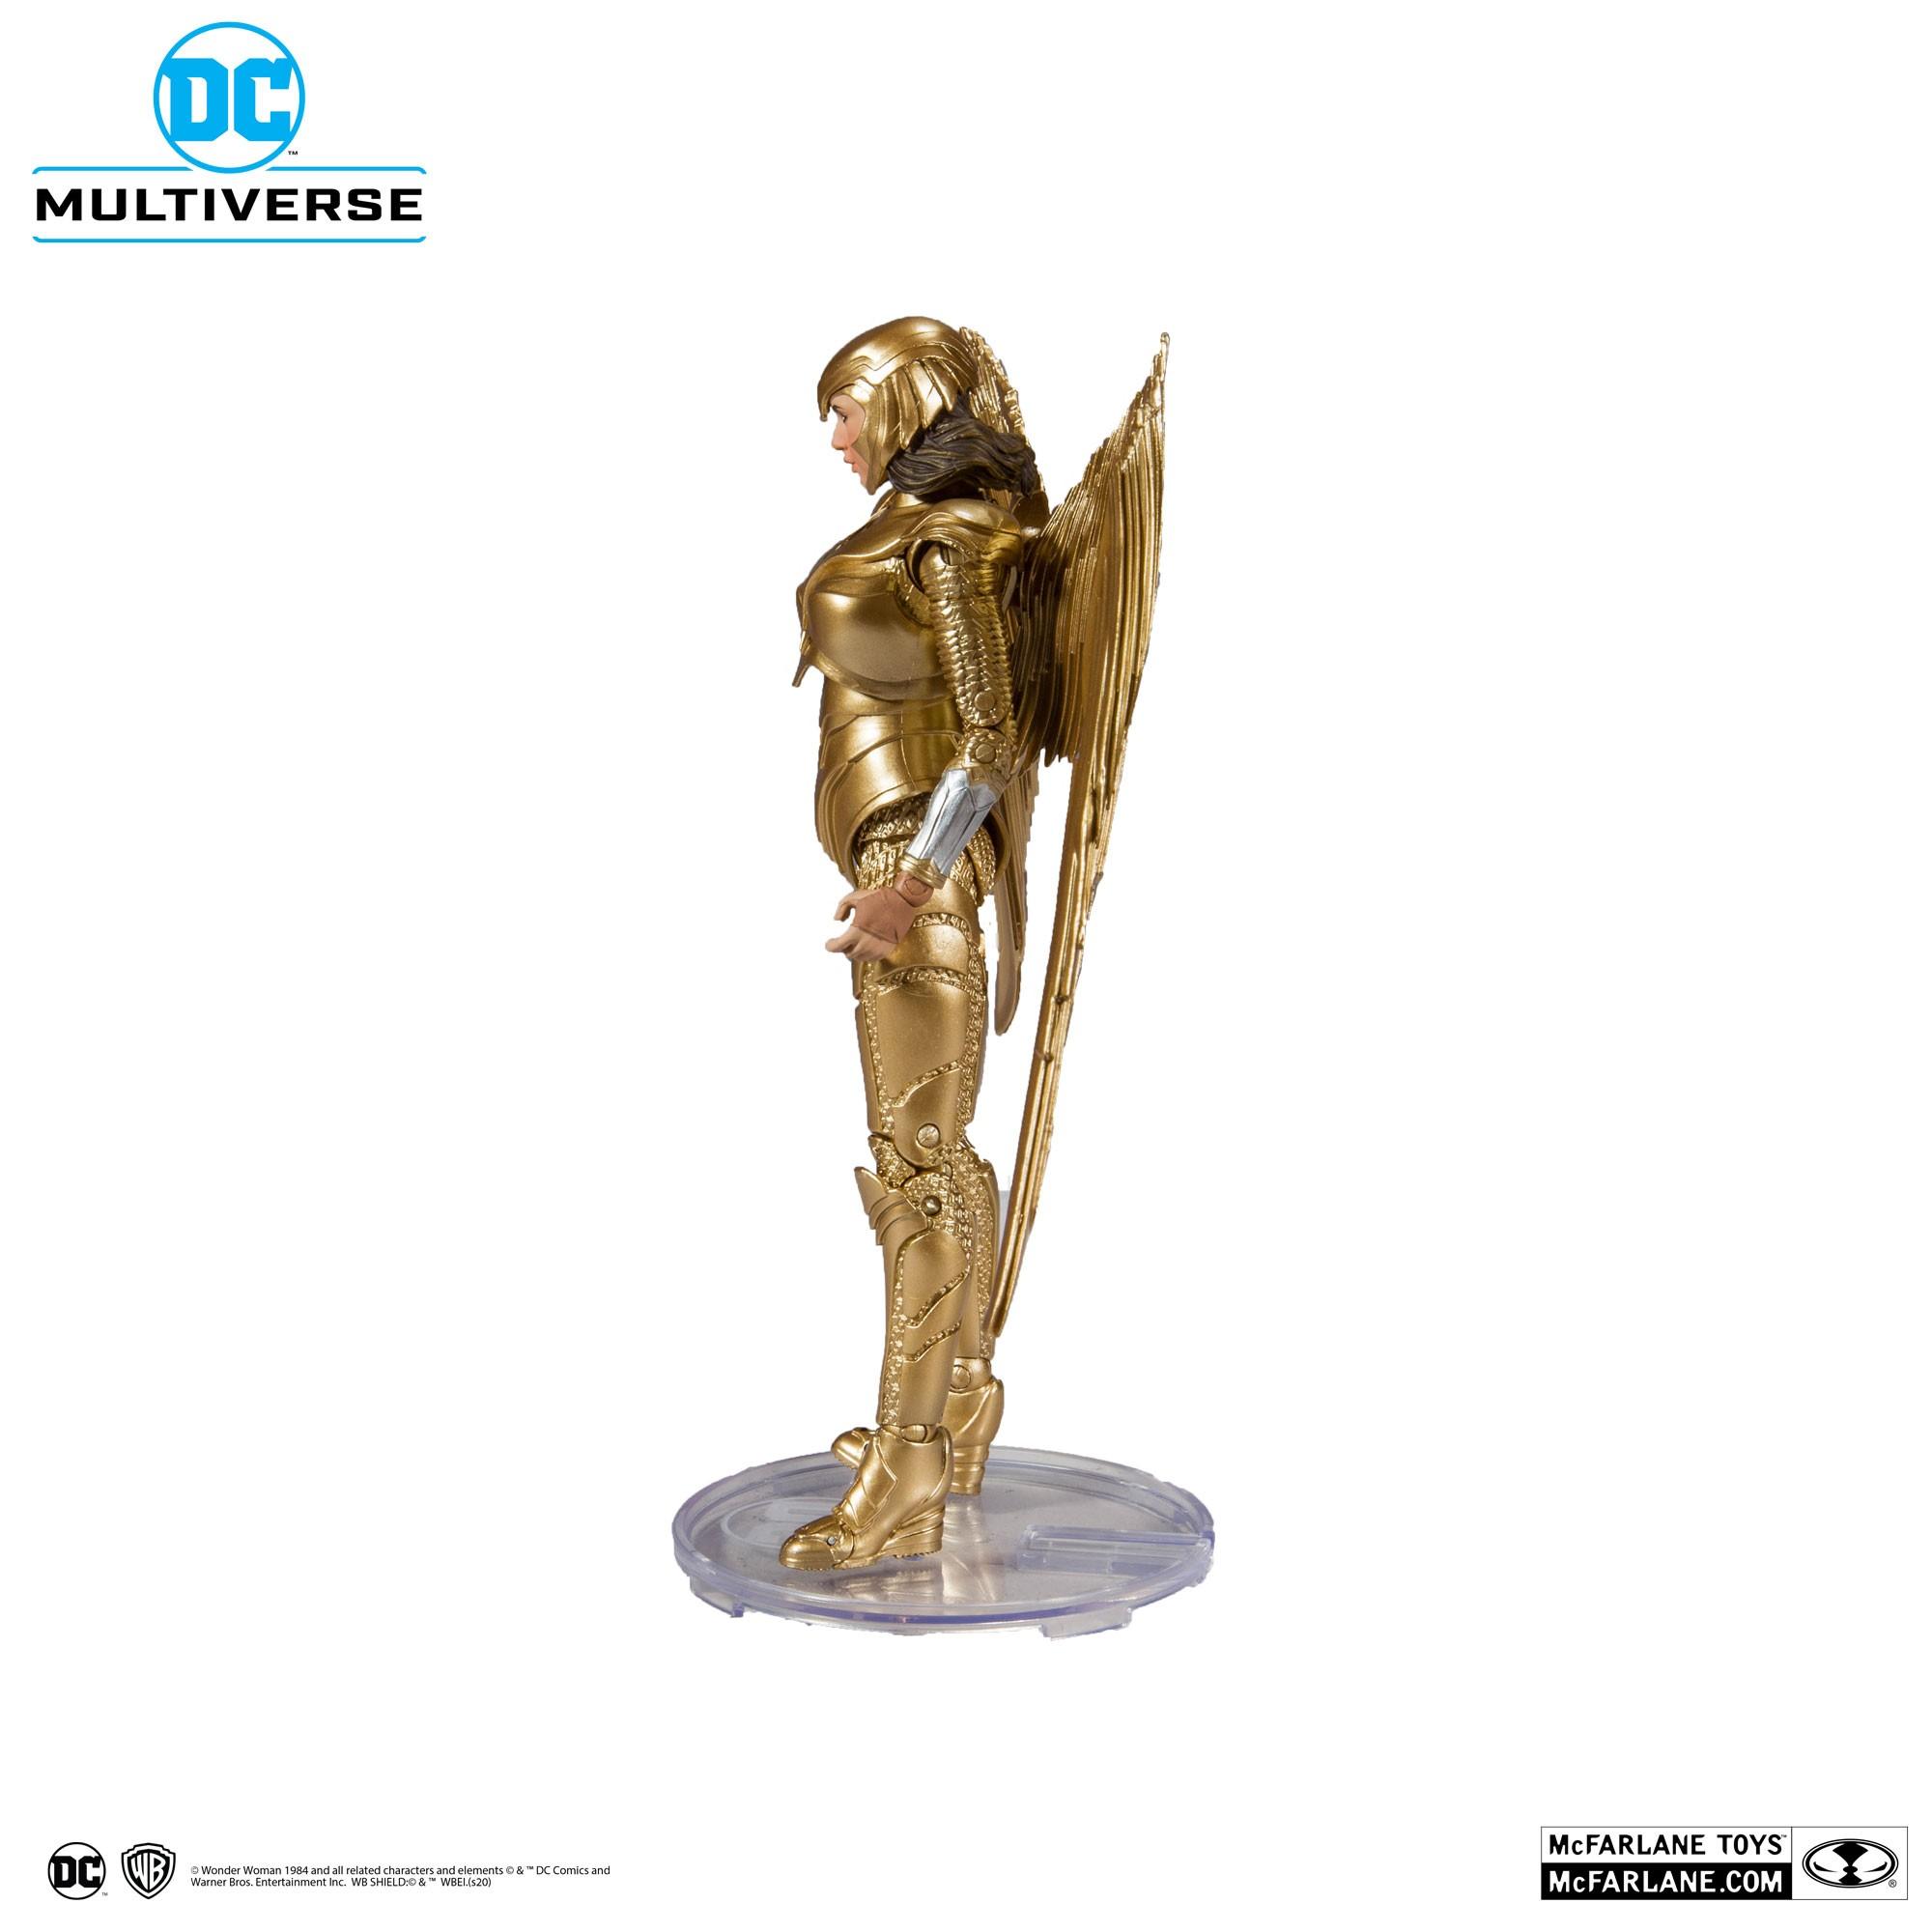 Action Figure Mulher Maravilha Armadura Dourada (Gold Armor): Wonde Woman 1984 (DC Multiverse) - McFarlane Toys